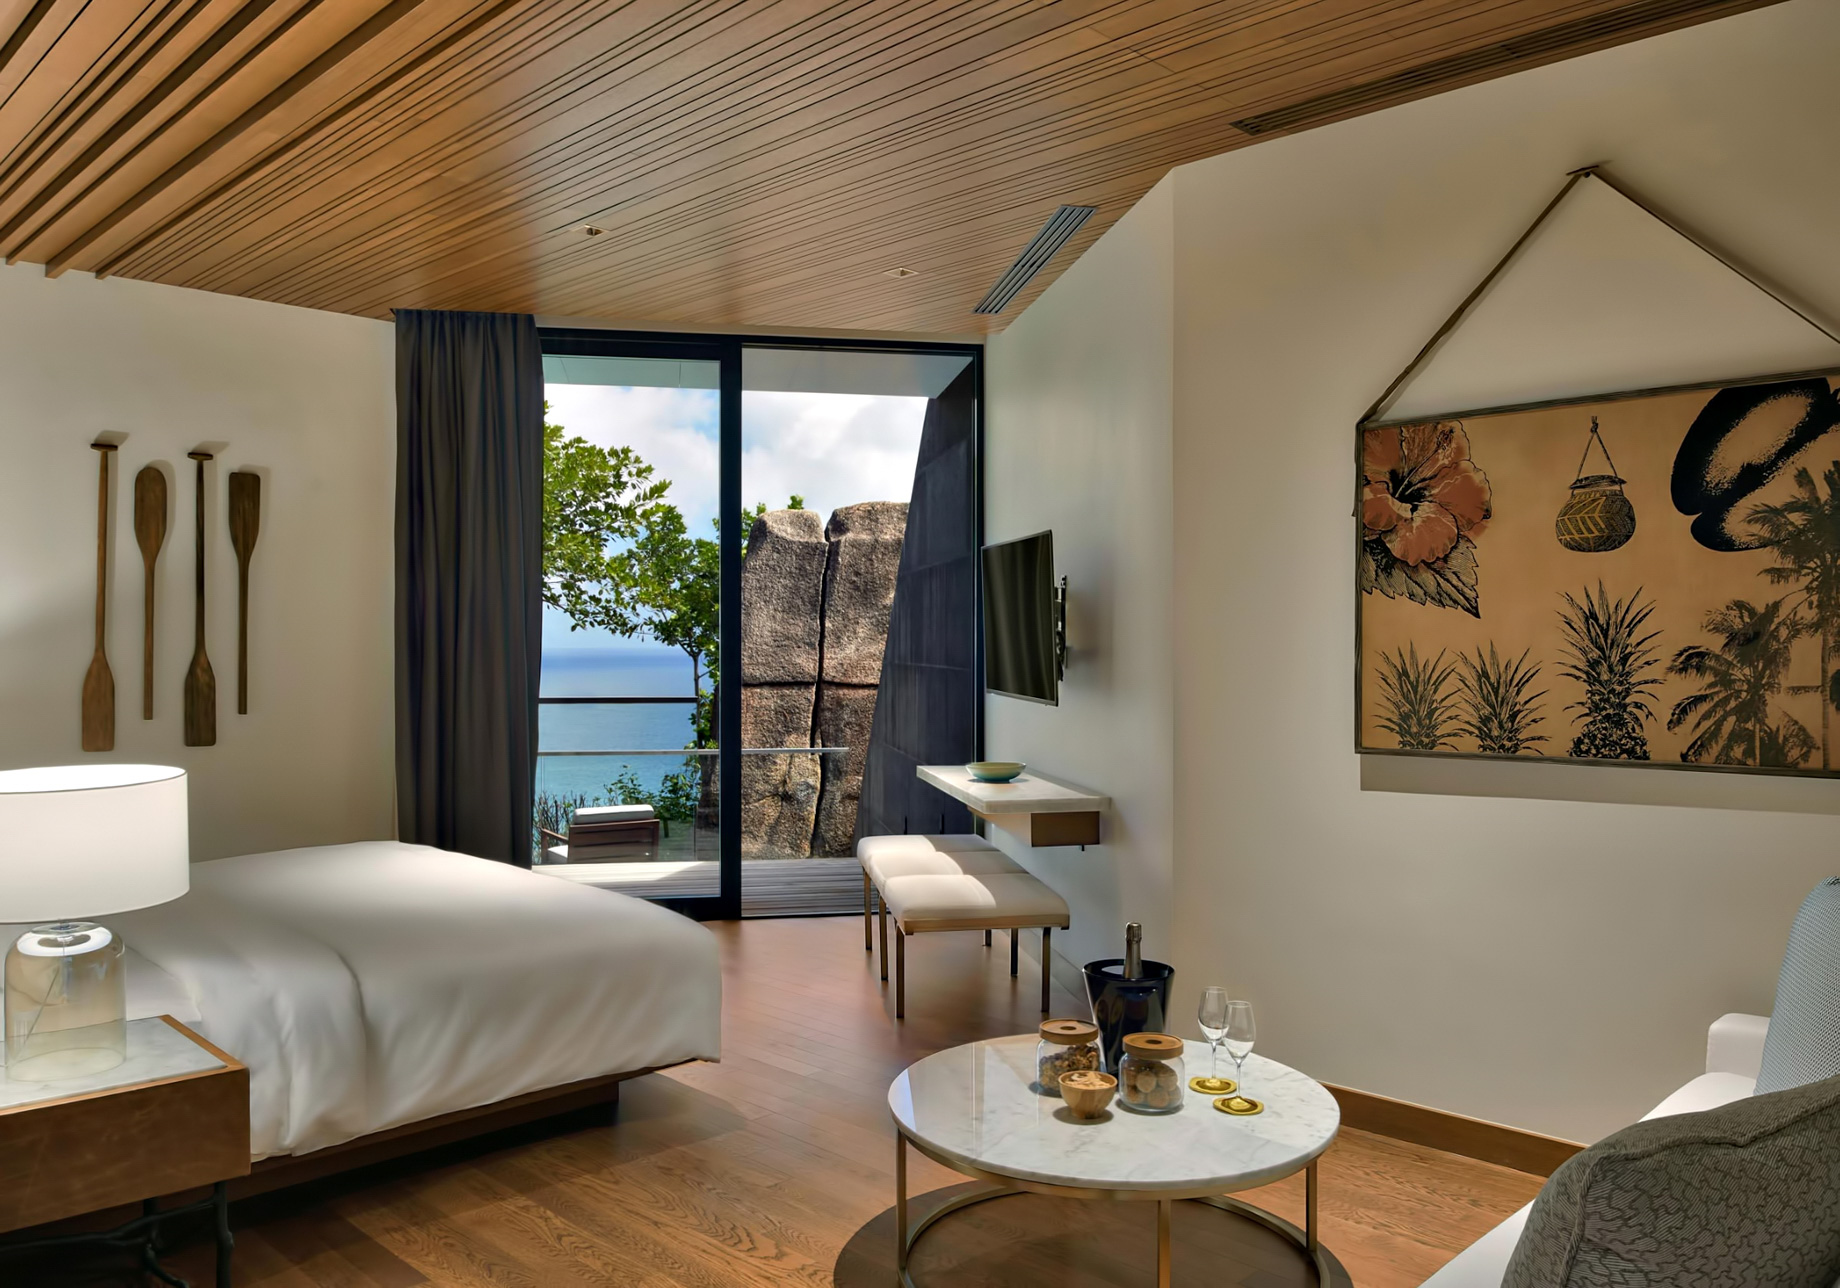 Three Bedroom Luxury Residence - Felicite Island, Seychelles - Bedroom